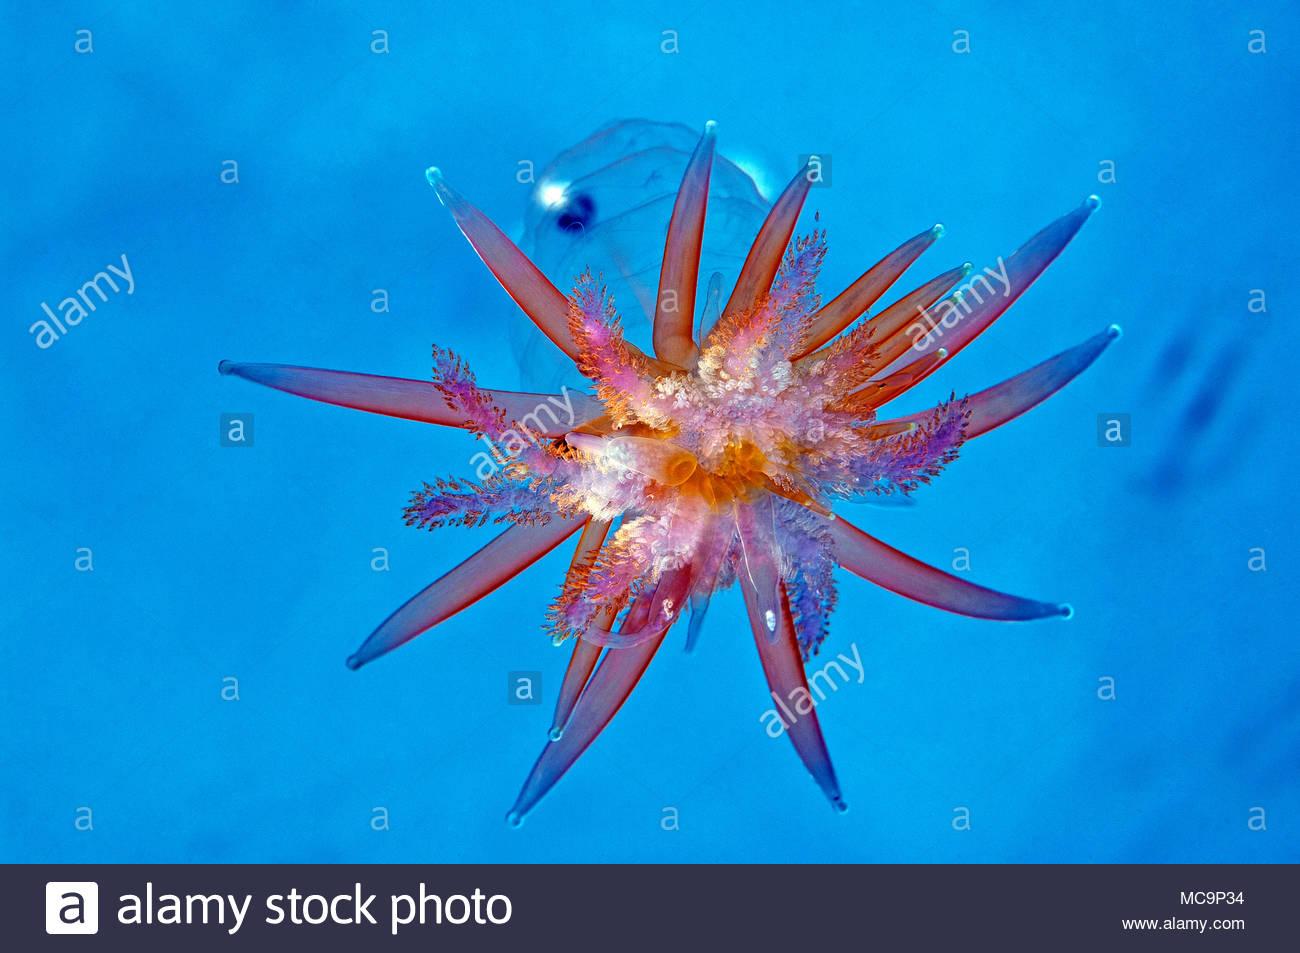 Staatsqualle (Physophora hydrostatica), Hordaland, Norwegen | Hula skirt siphonophore (Physophora hydrostatica), Hordaland, Norway - Stock Image